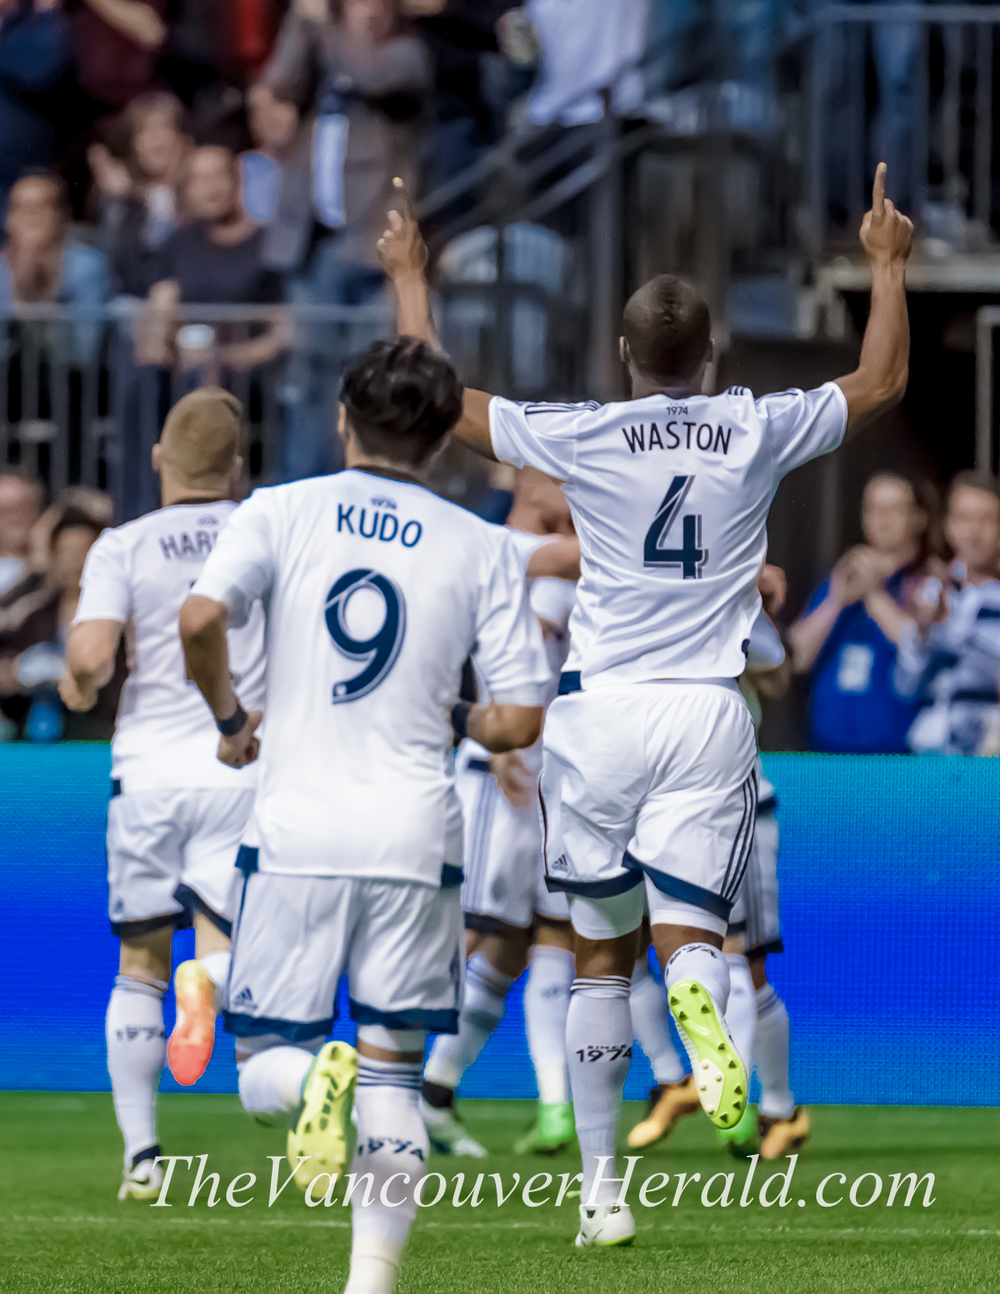 2016-04-27 Vancouver Whitecaps FC Goal Celebration (Bolaños).jpg